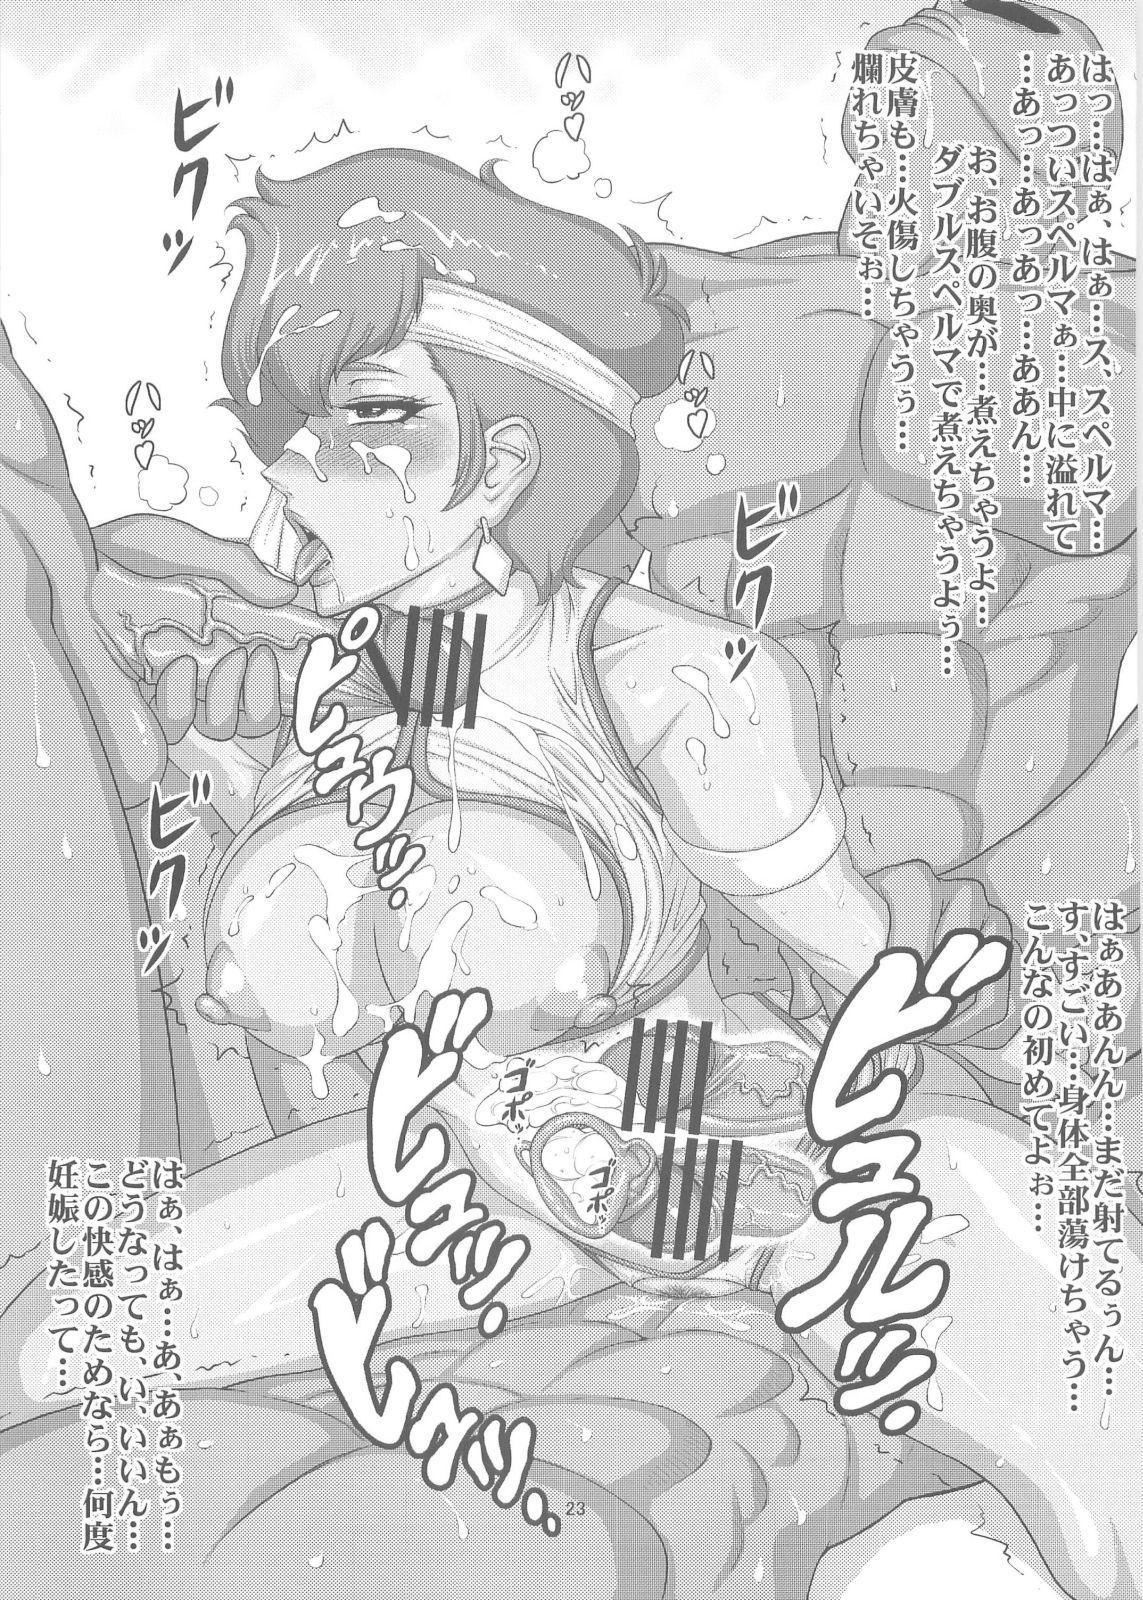 (C83) [Kikumizuan (Kikumizu Shouichi)] Lovely Erotics ~ K*i no Baai ~   Lovely Erotics -The Case of K*i- (Dirty Pair) 24